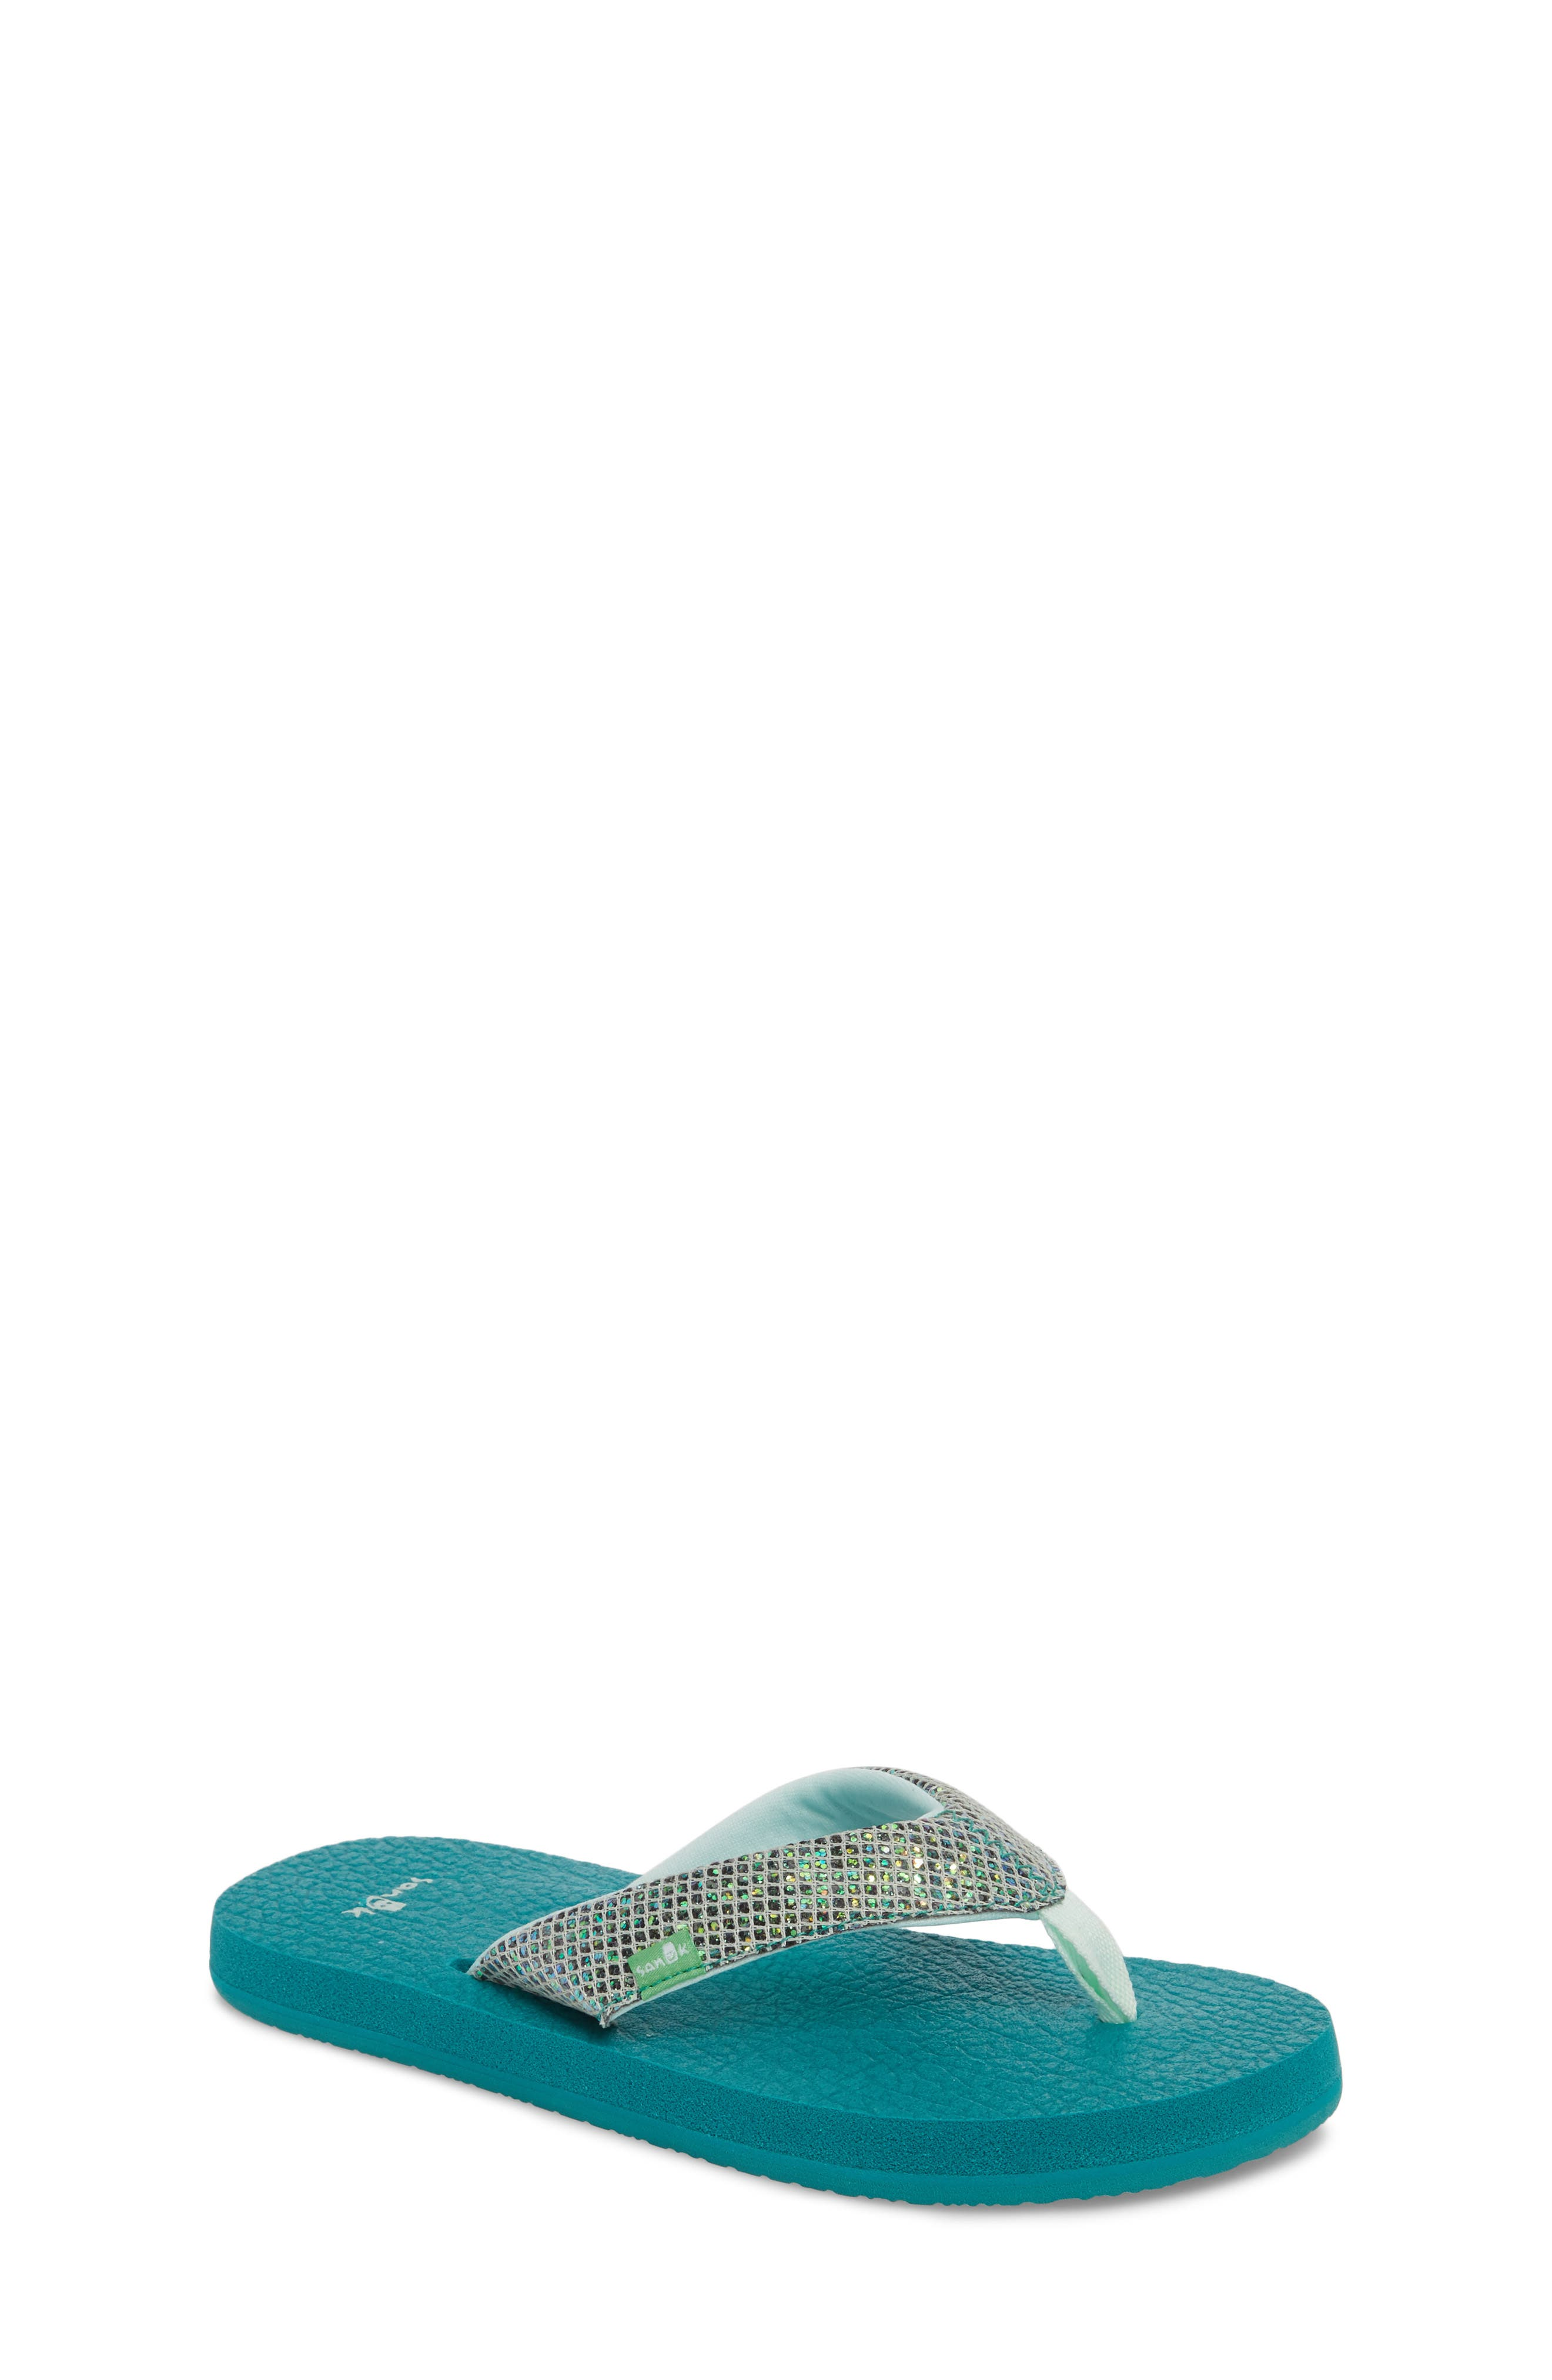 'Yoga' Glitter Sandal,                         Main,                         color, Sea Green